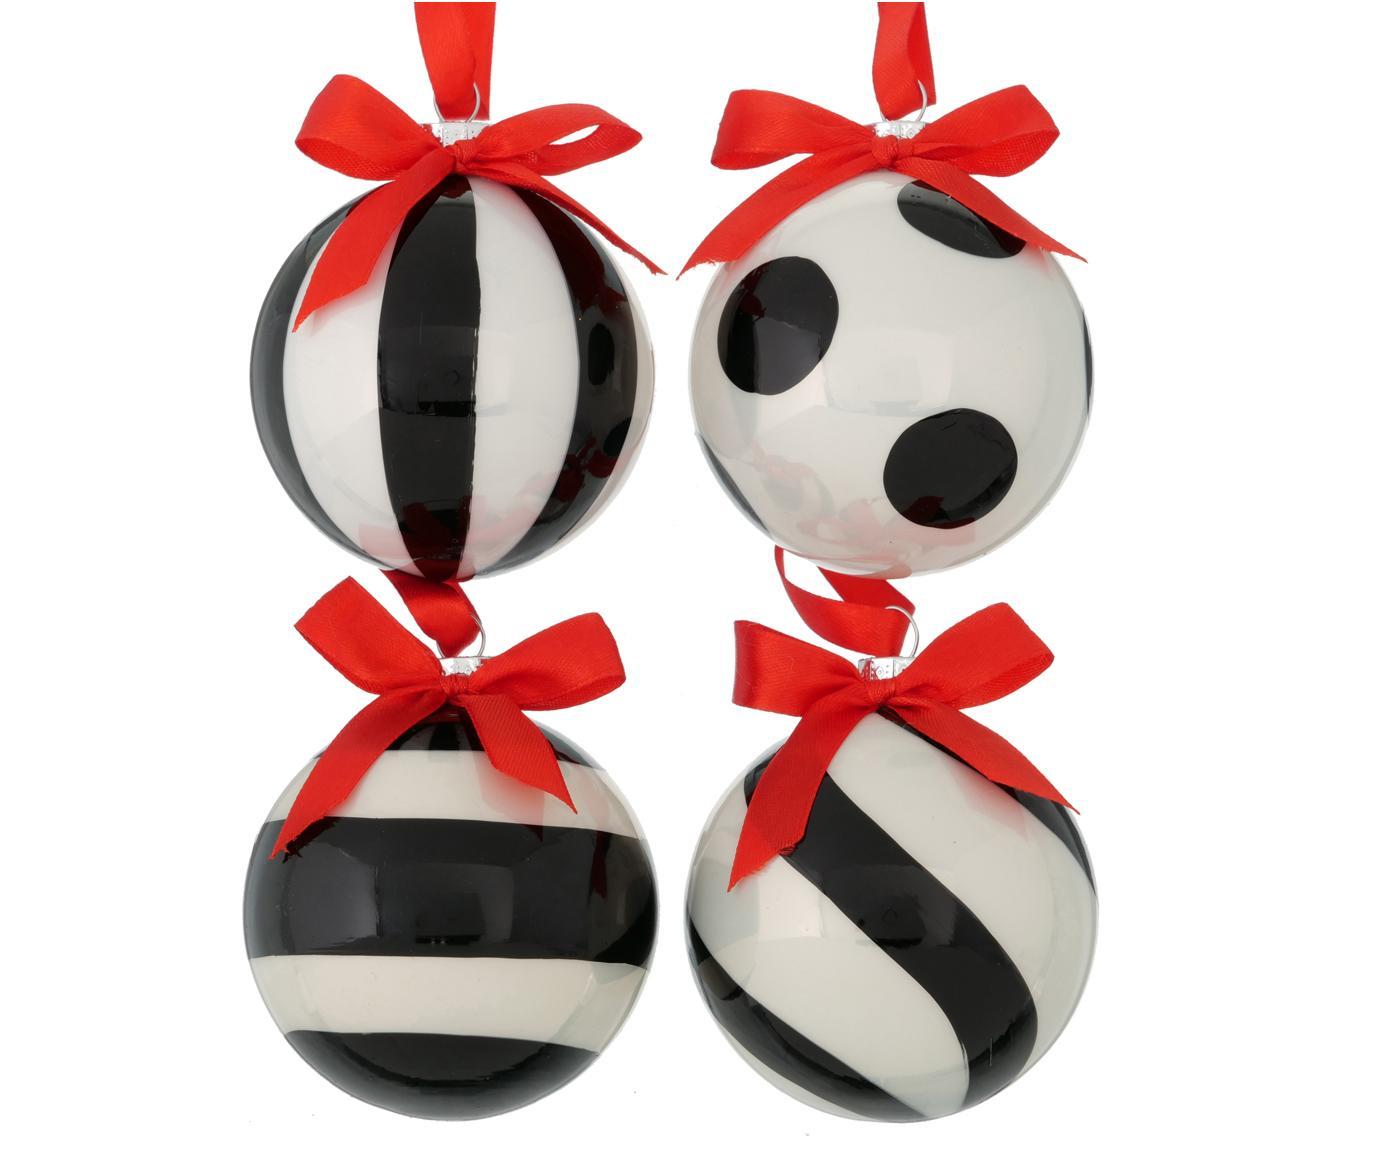 Kerstballenset Geoma, 4-delig, Zwart, wit, rood, Ø 8 cm